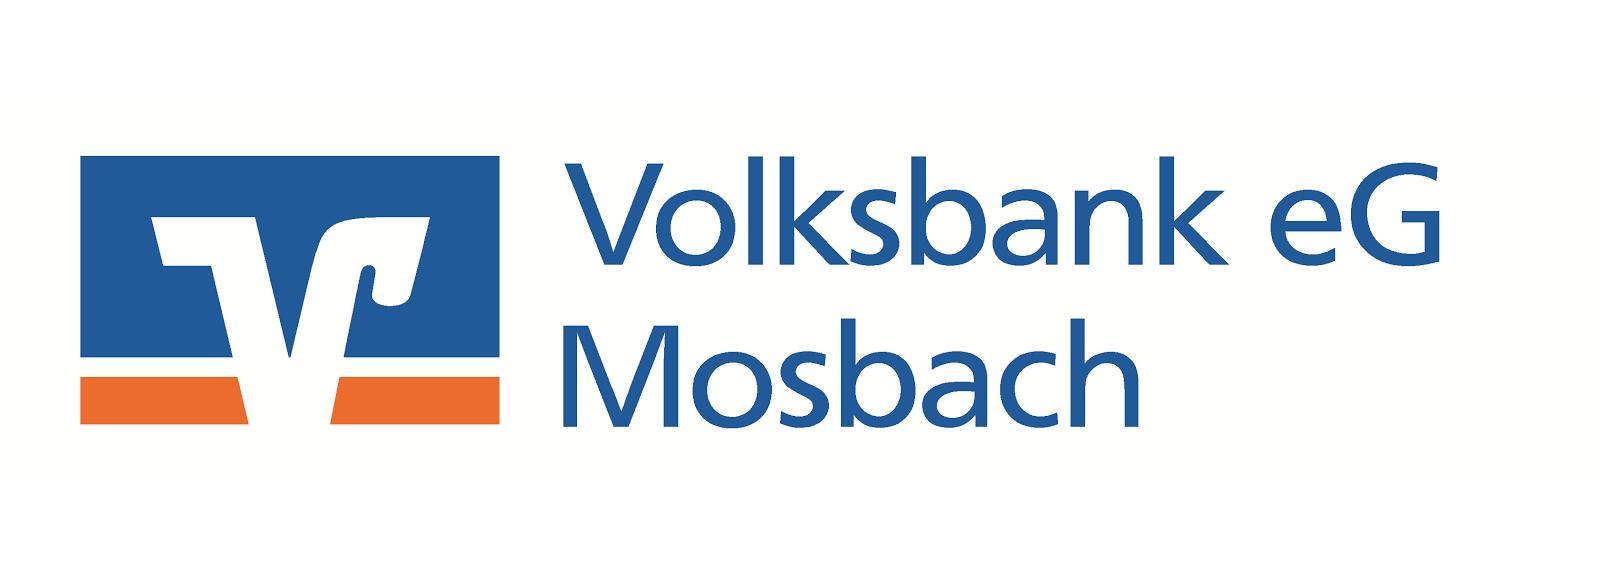 Volksbank eG Mosbach